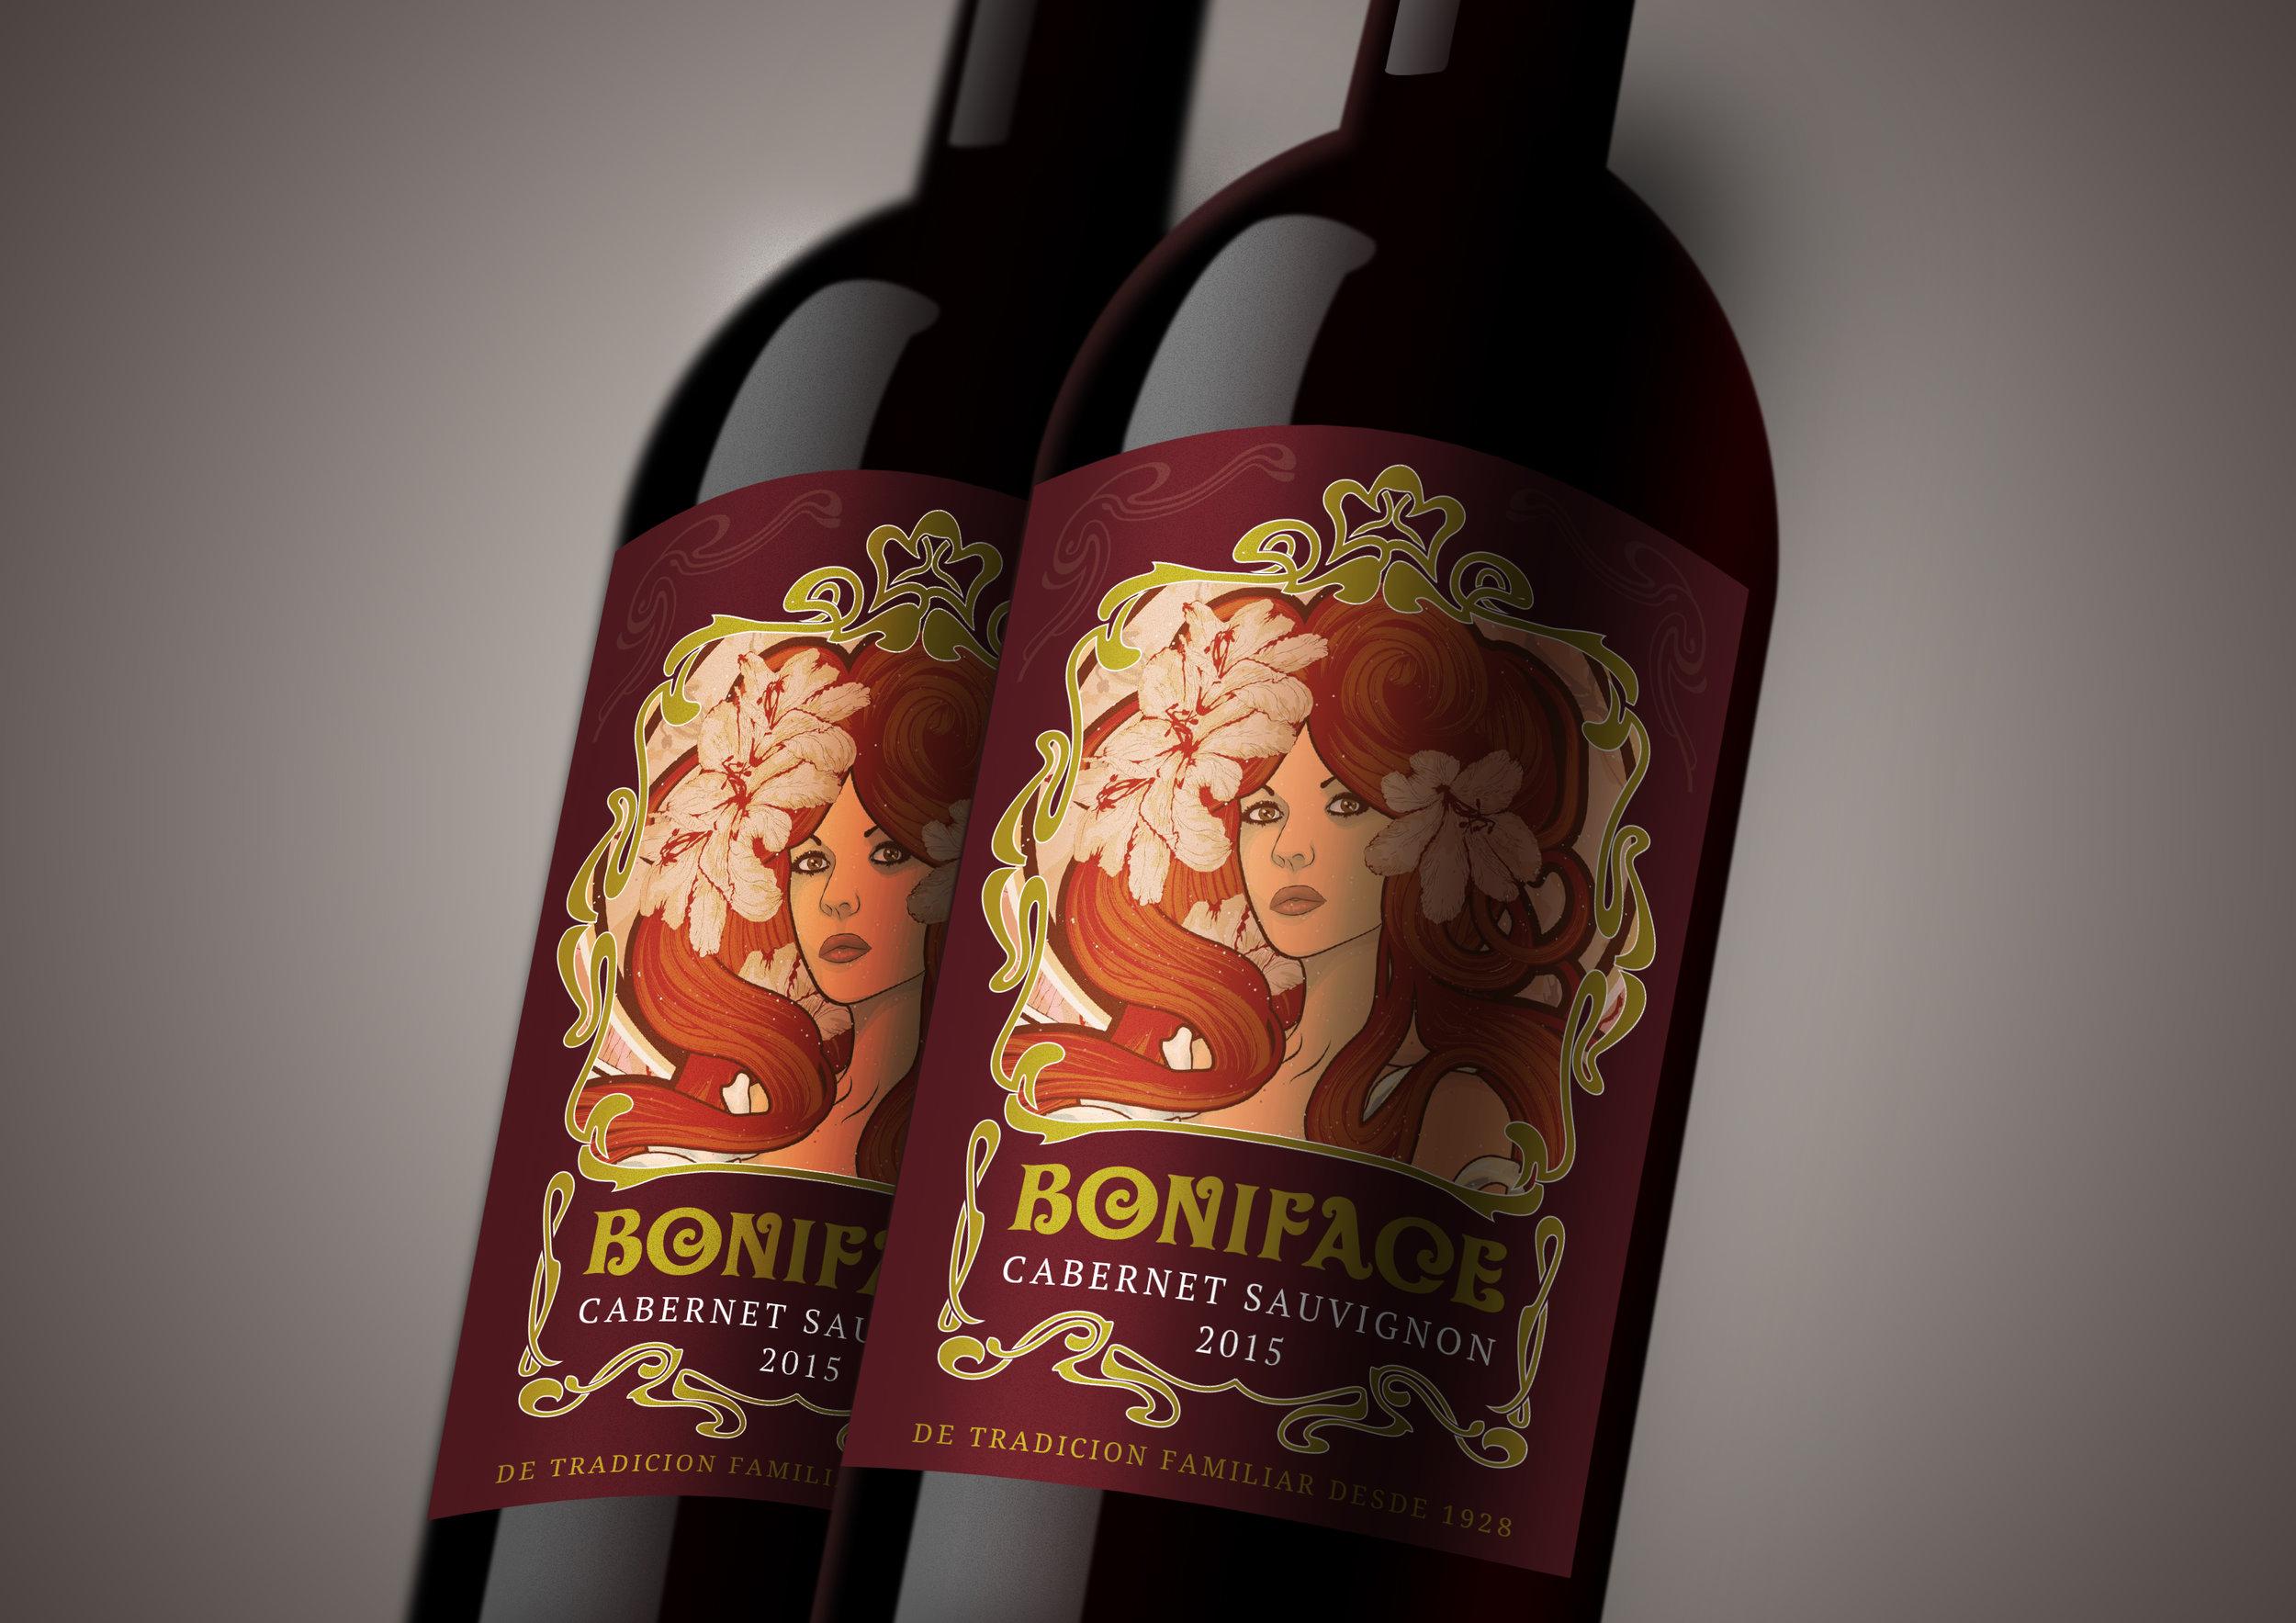 2 Bottle Mock Up Boniface.jpg